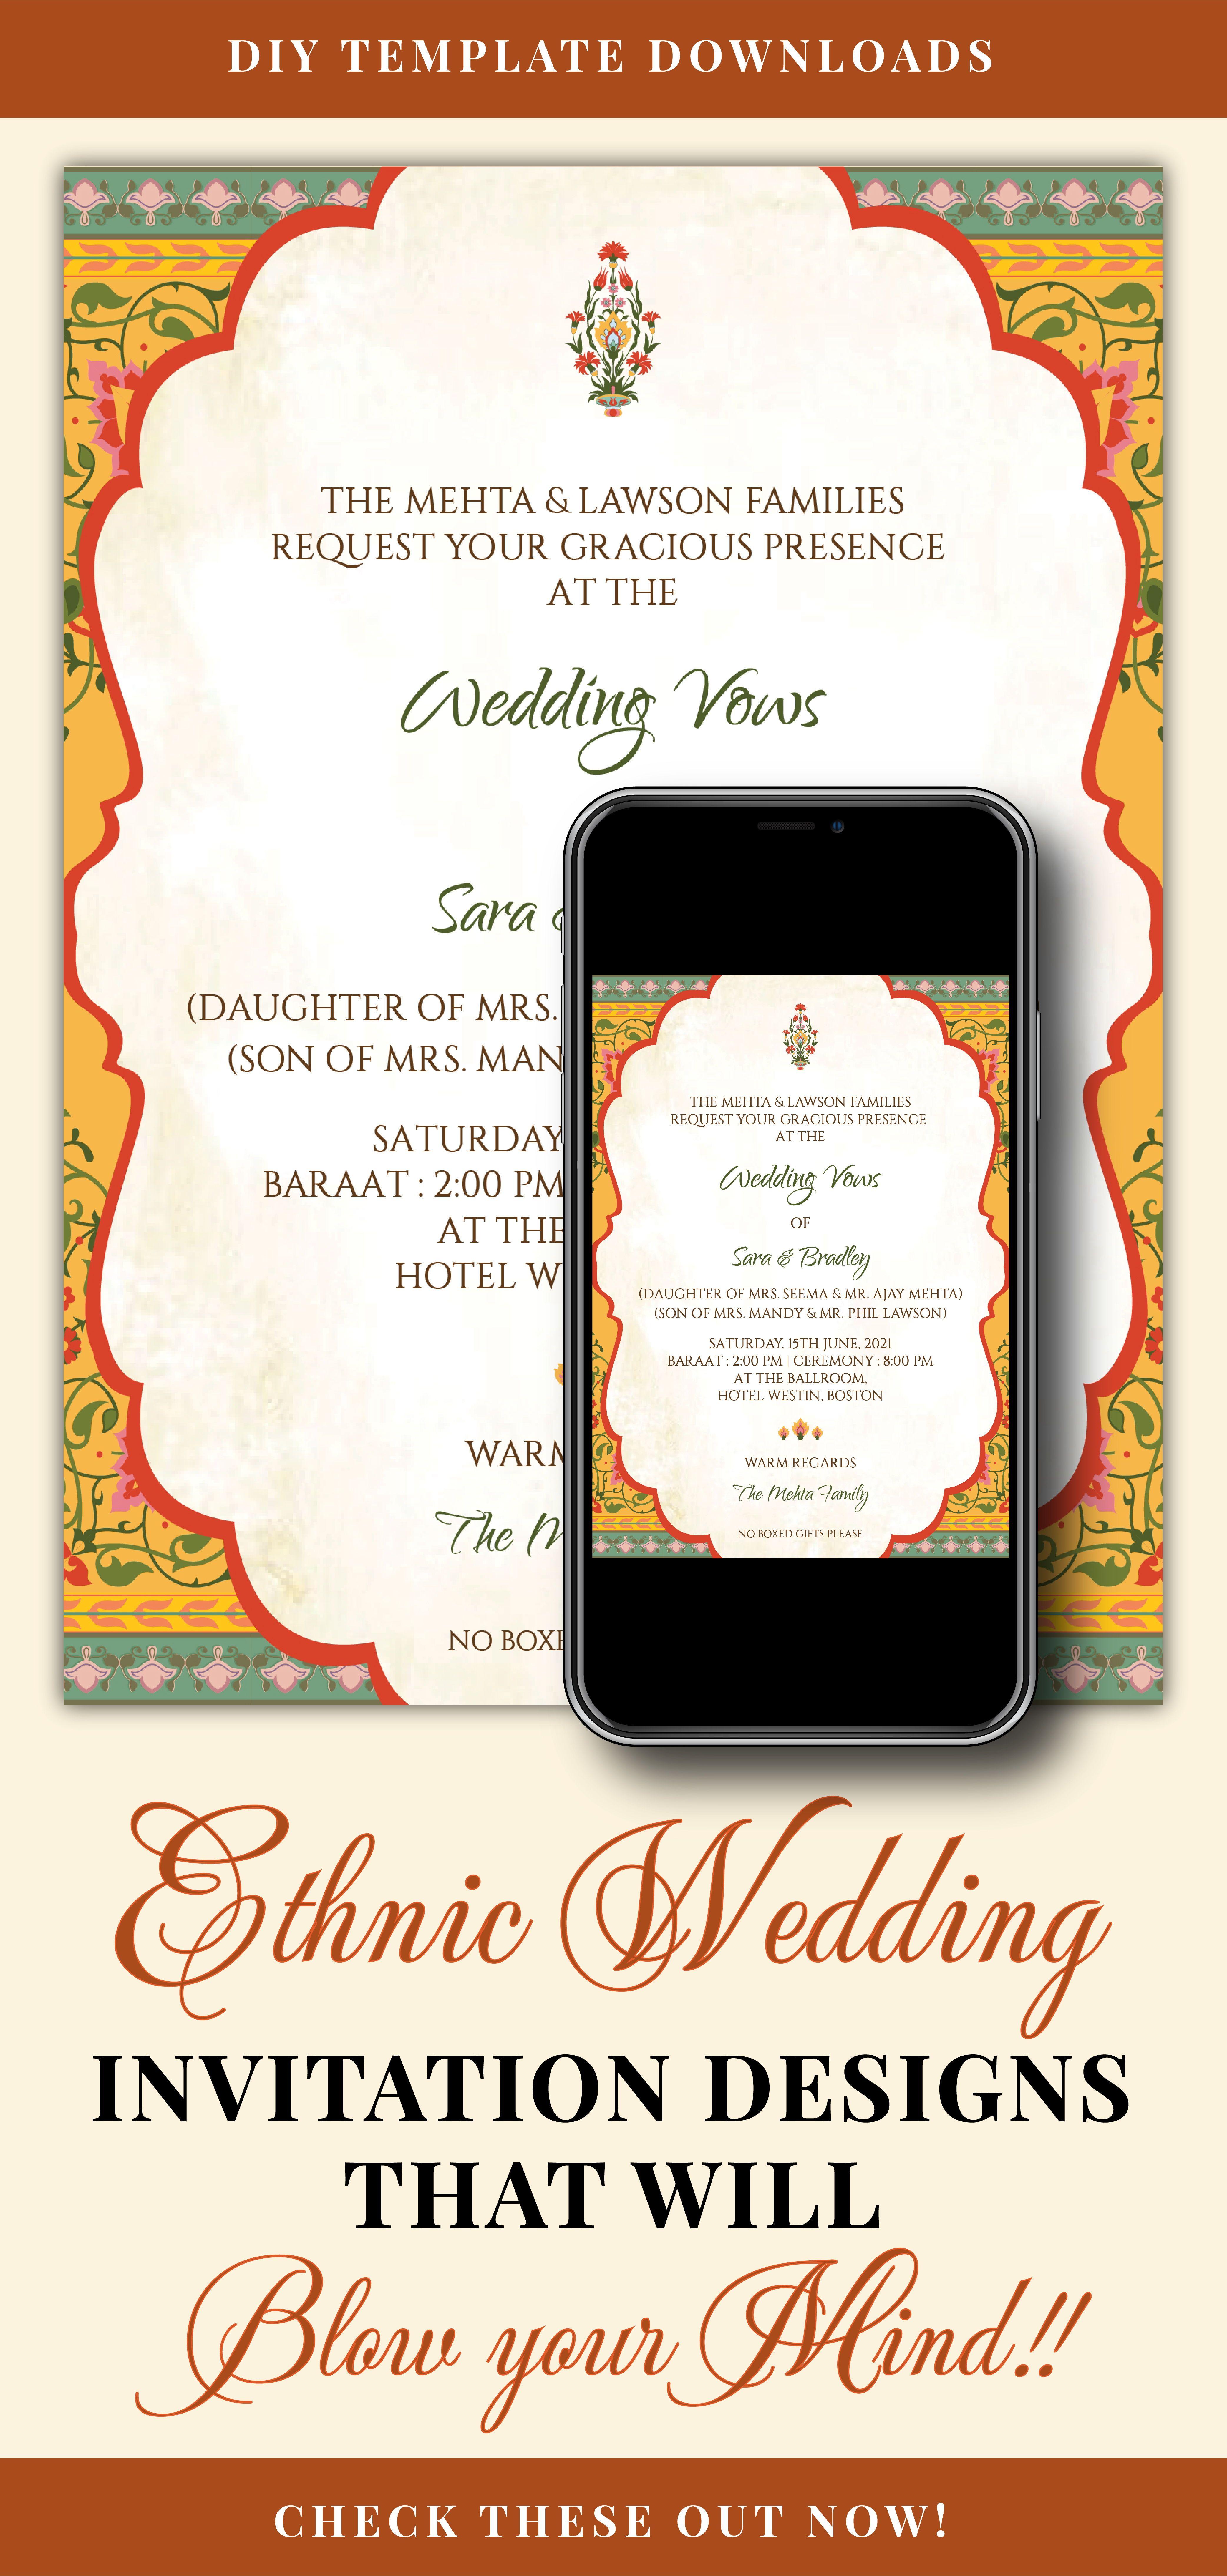 Moroccan Wedding Invitation Card With Bright Colors Gold Invitation For A Wedding Invitations Stationery Moroccan Wedding Invitations Wedding Invitations Diy